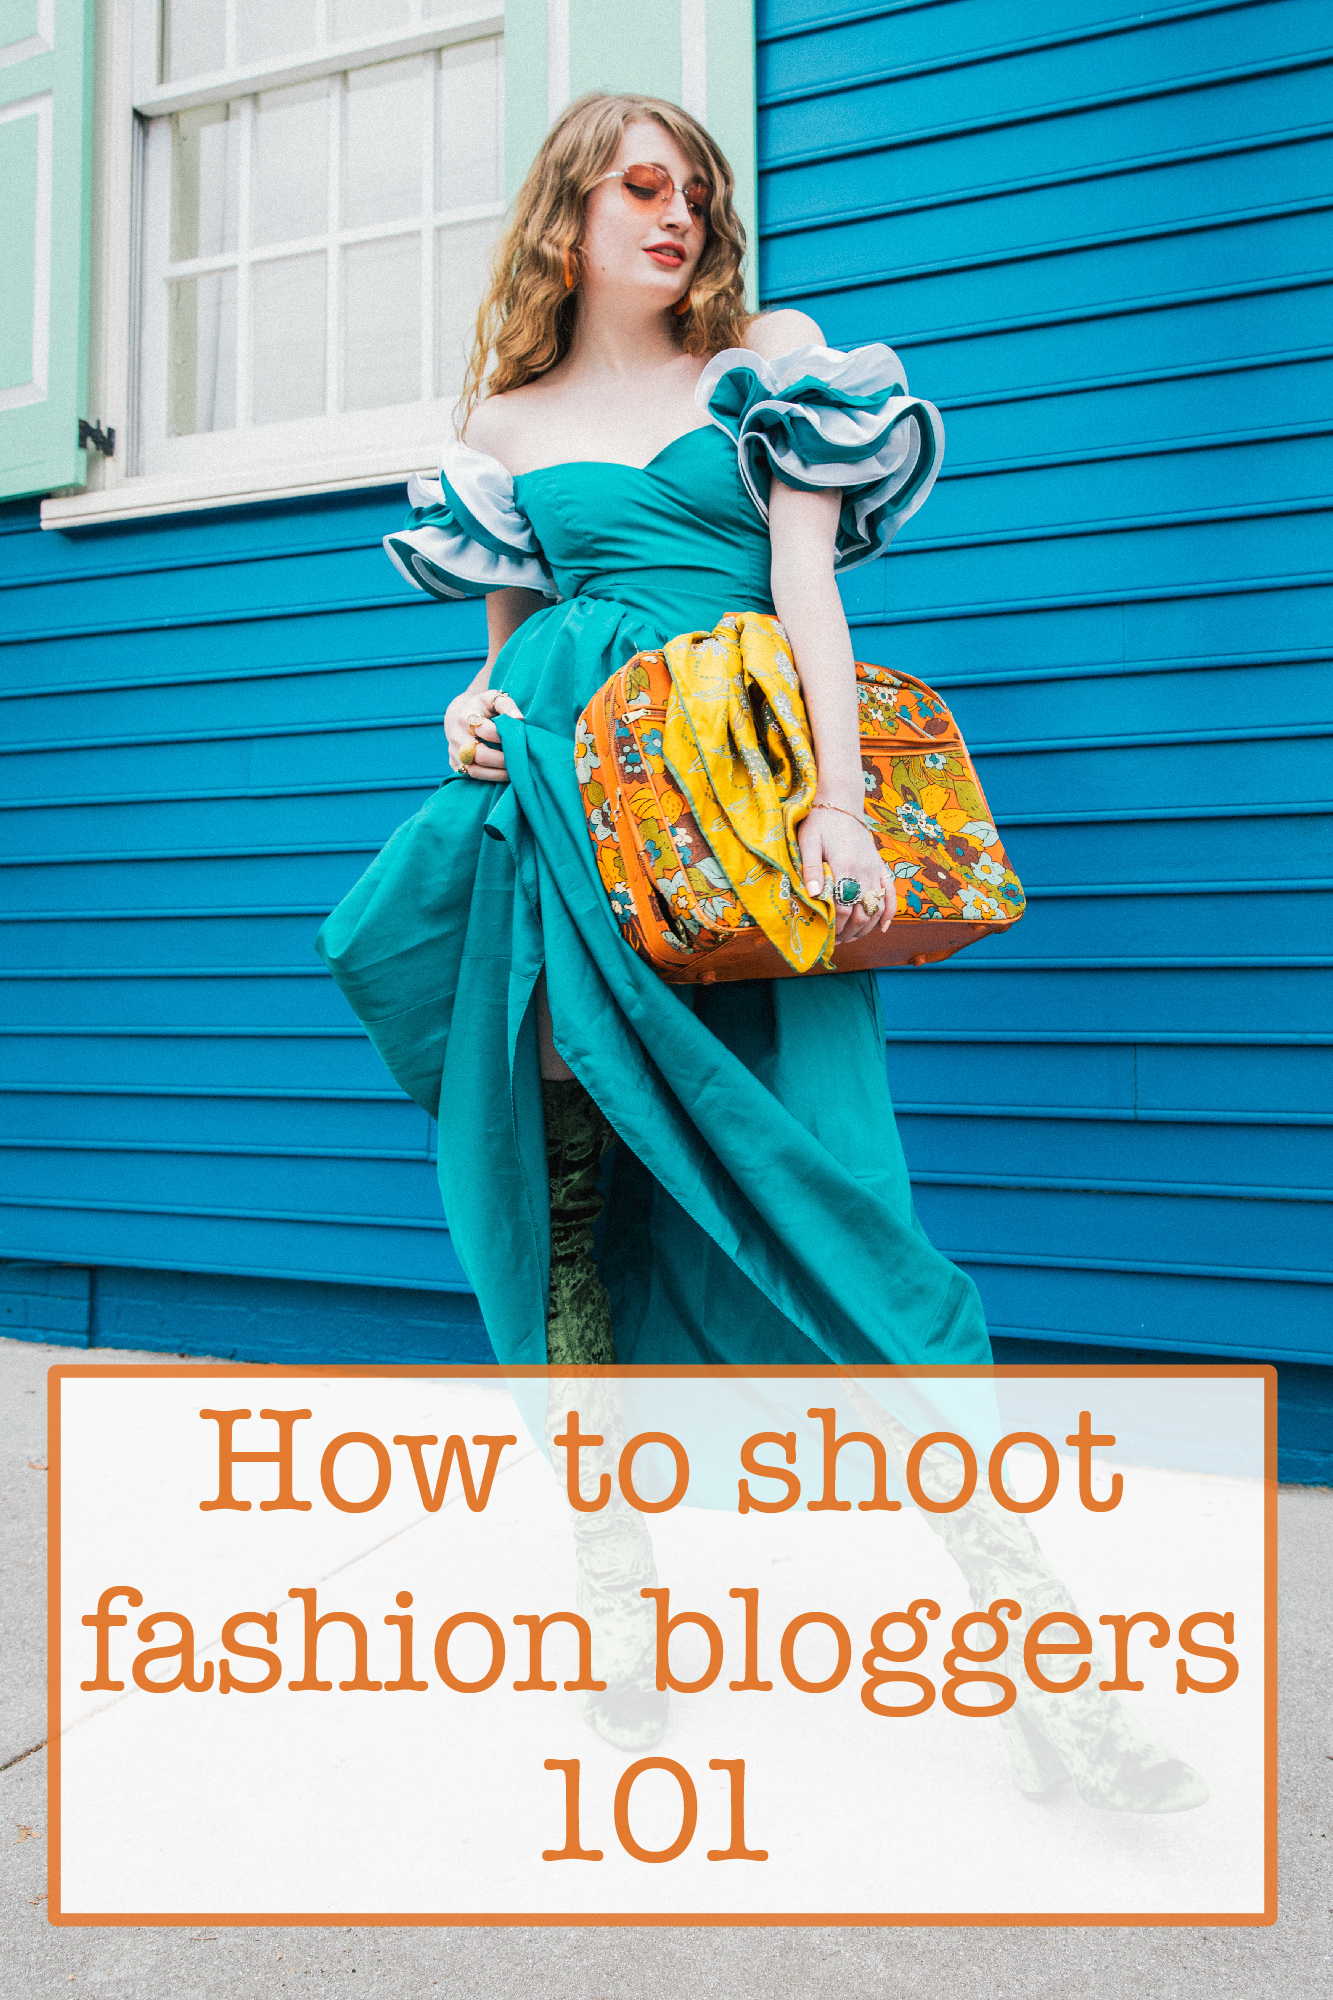 howtoshootfashionbloggers-01.jpg